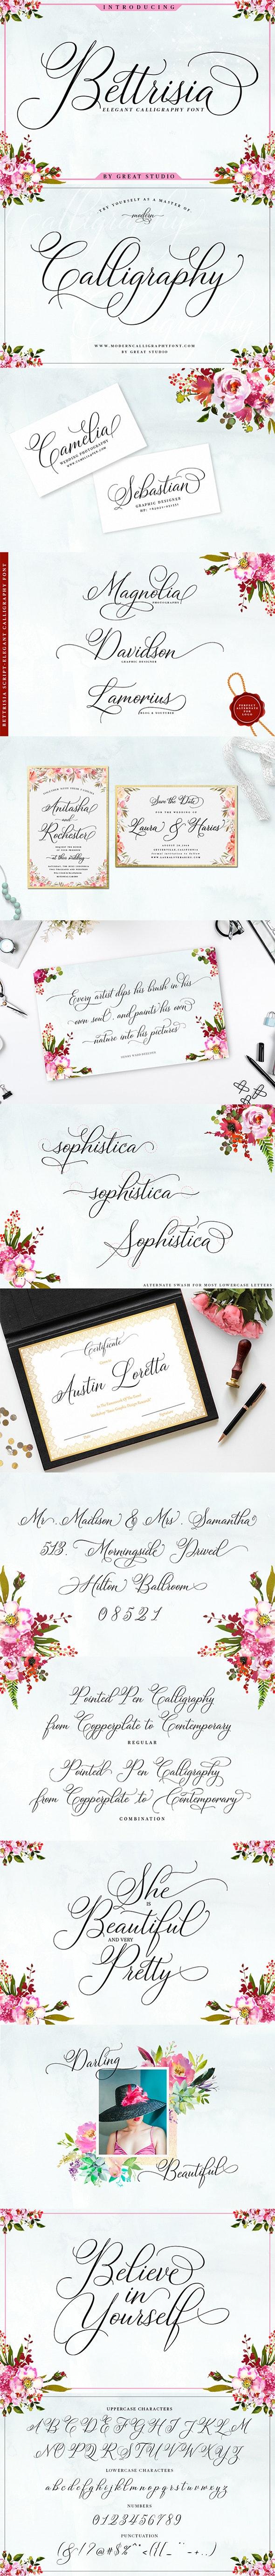 Bettrisia Script - Calligraphy Script